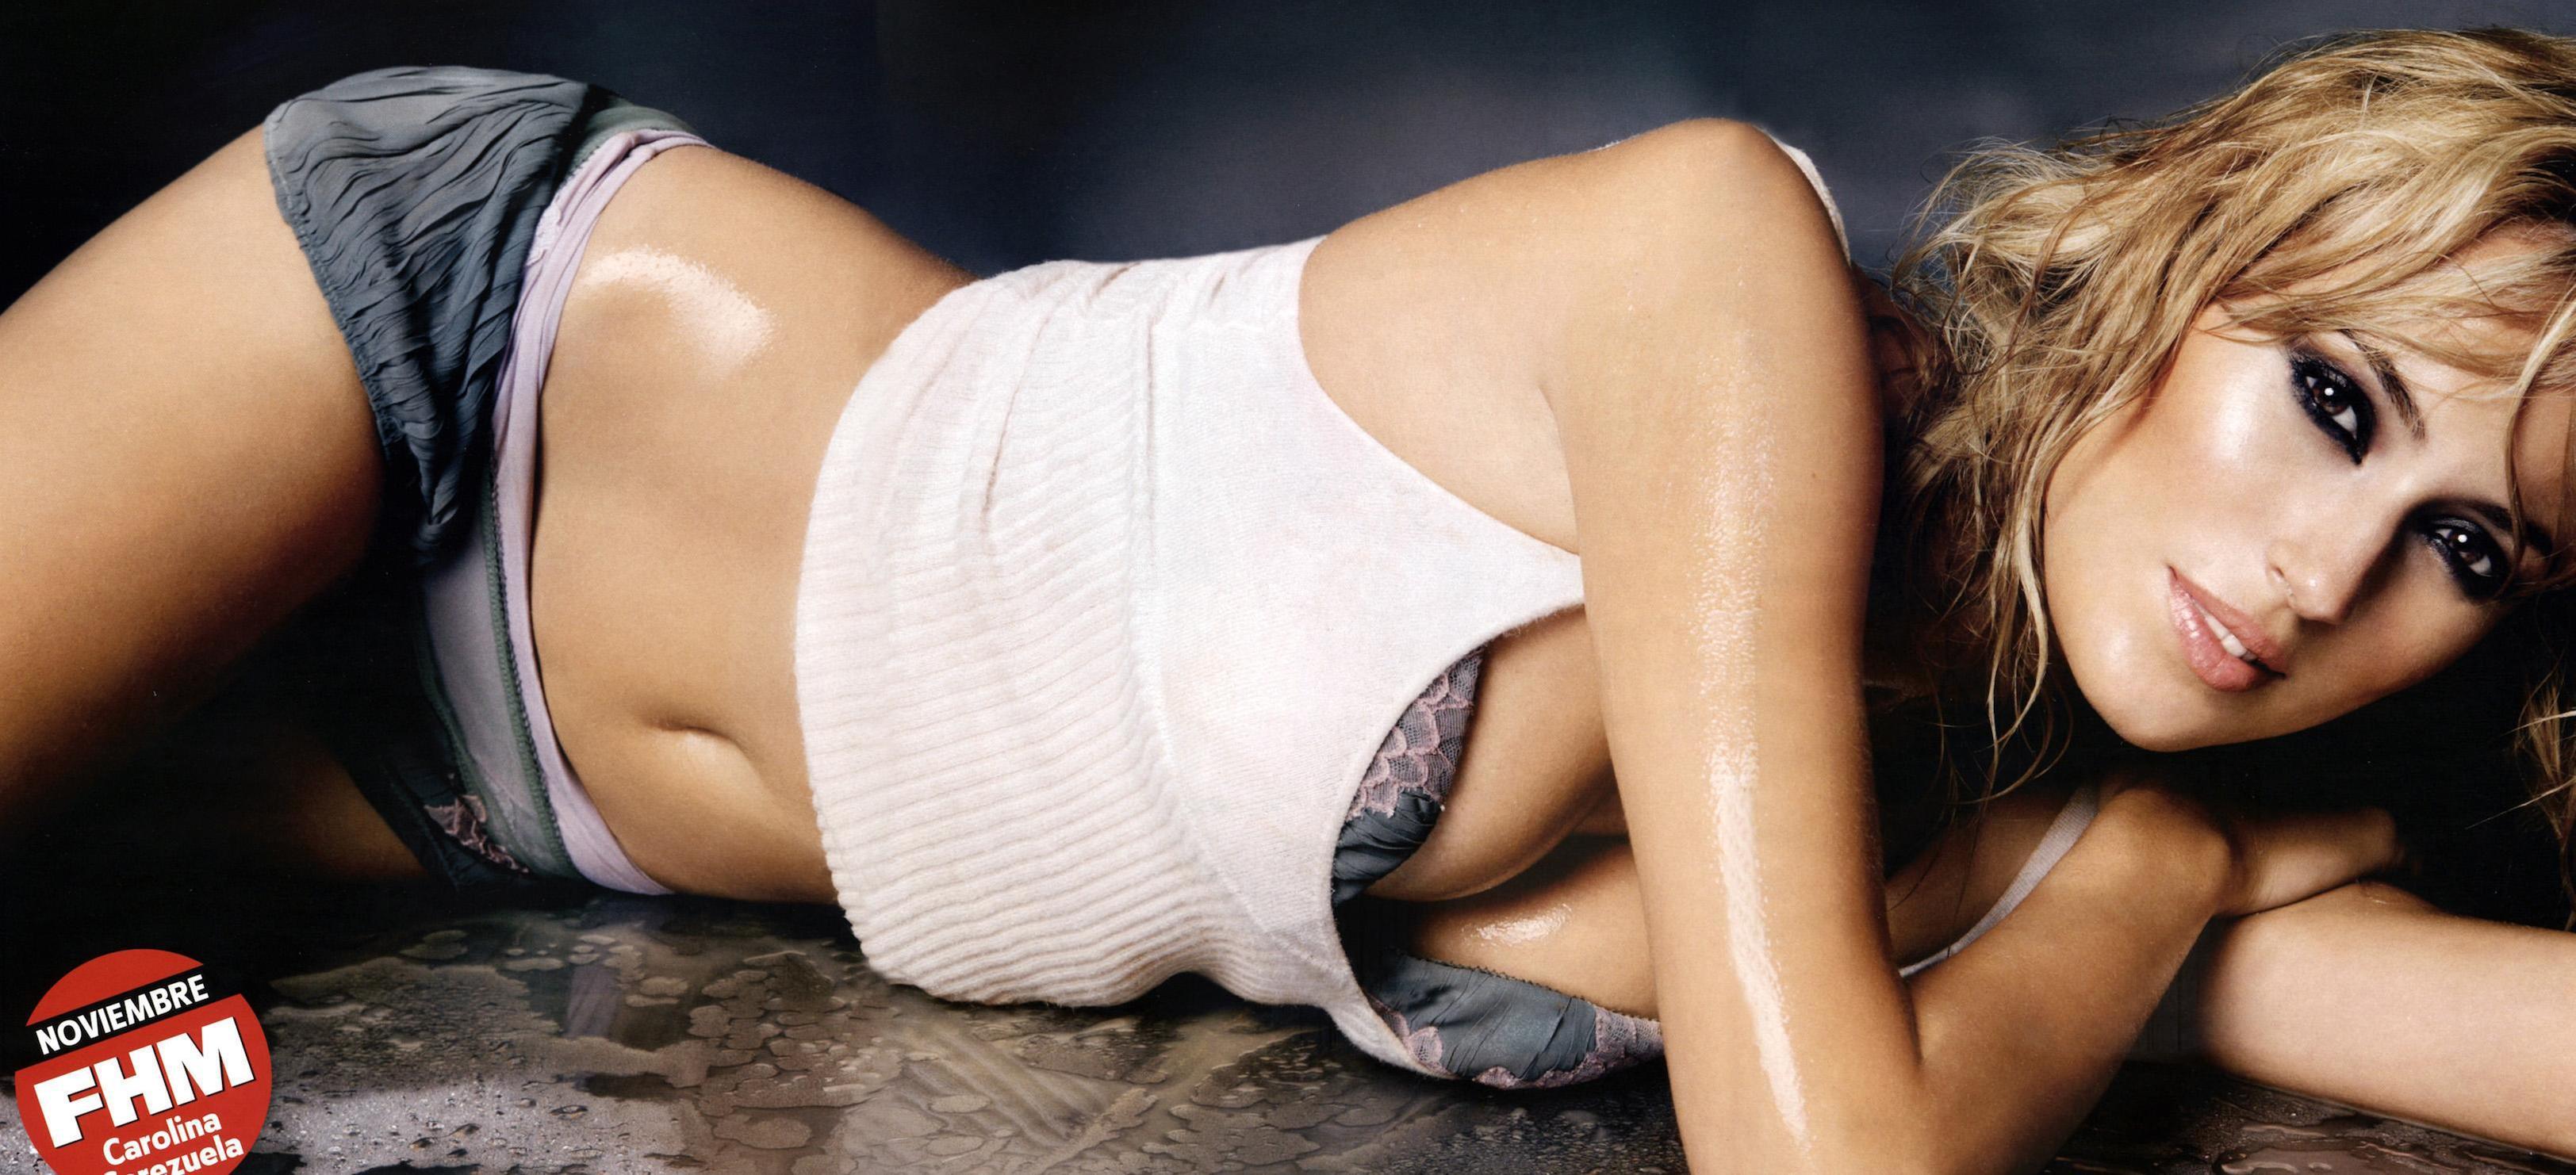 Carolina Cerezuela desnuda coño